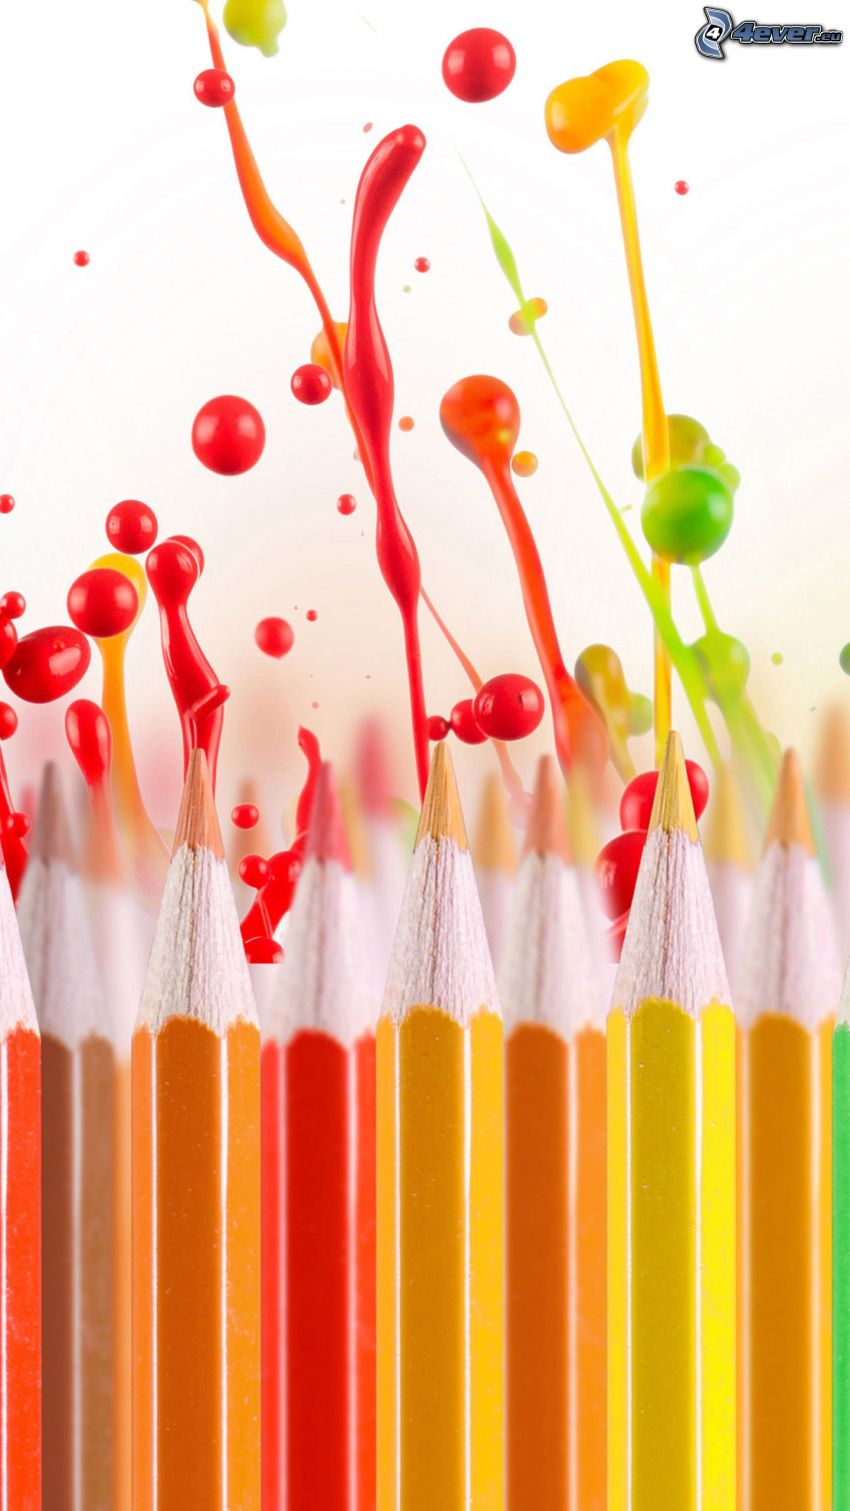 Buntstifte, Farben